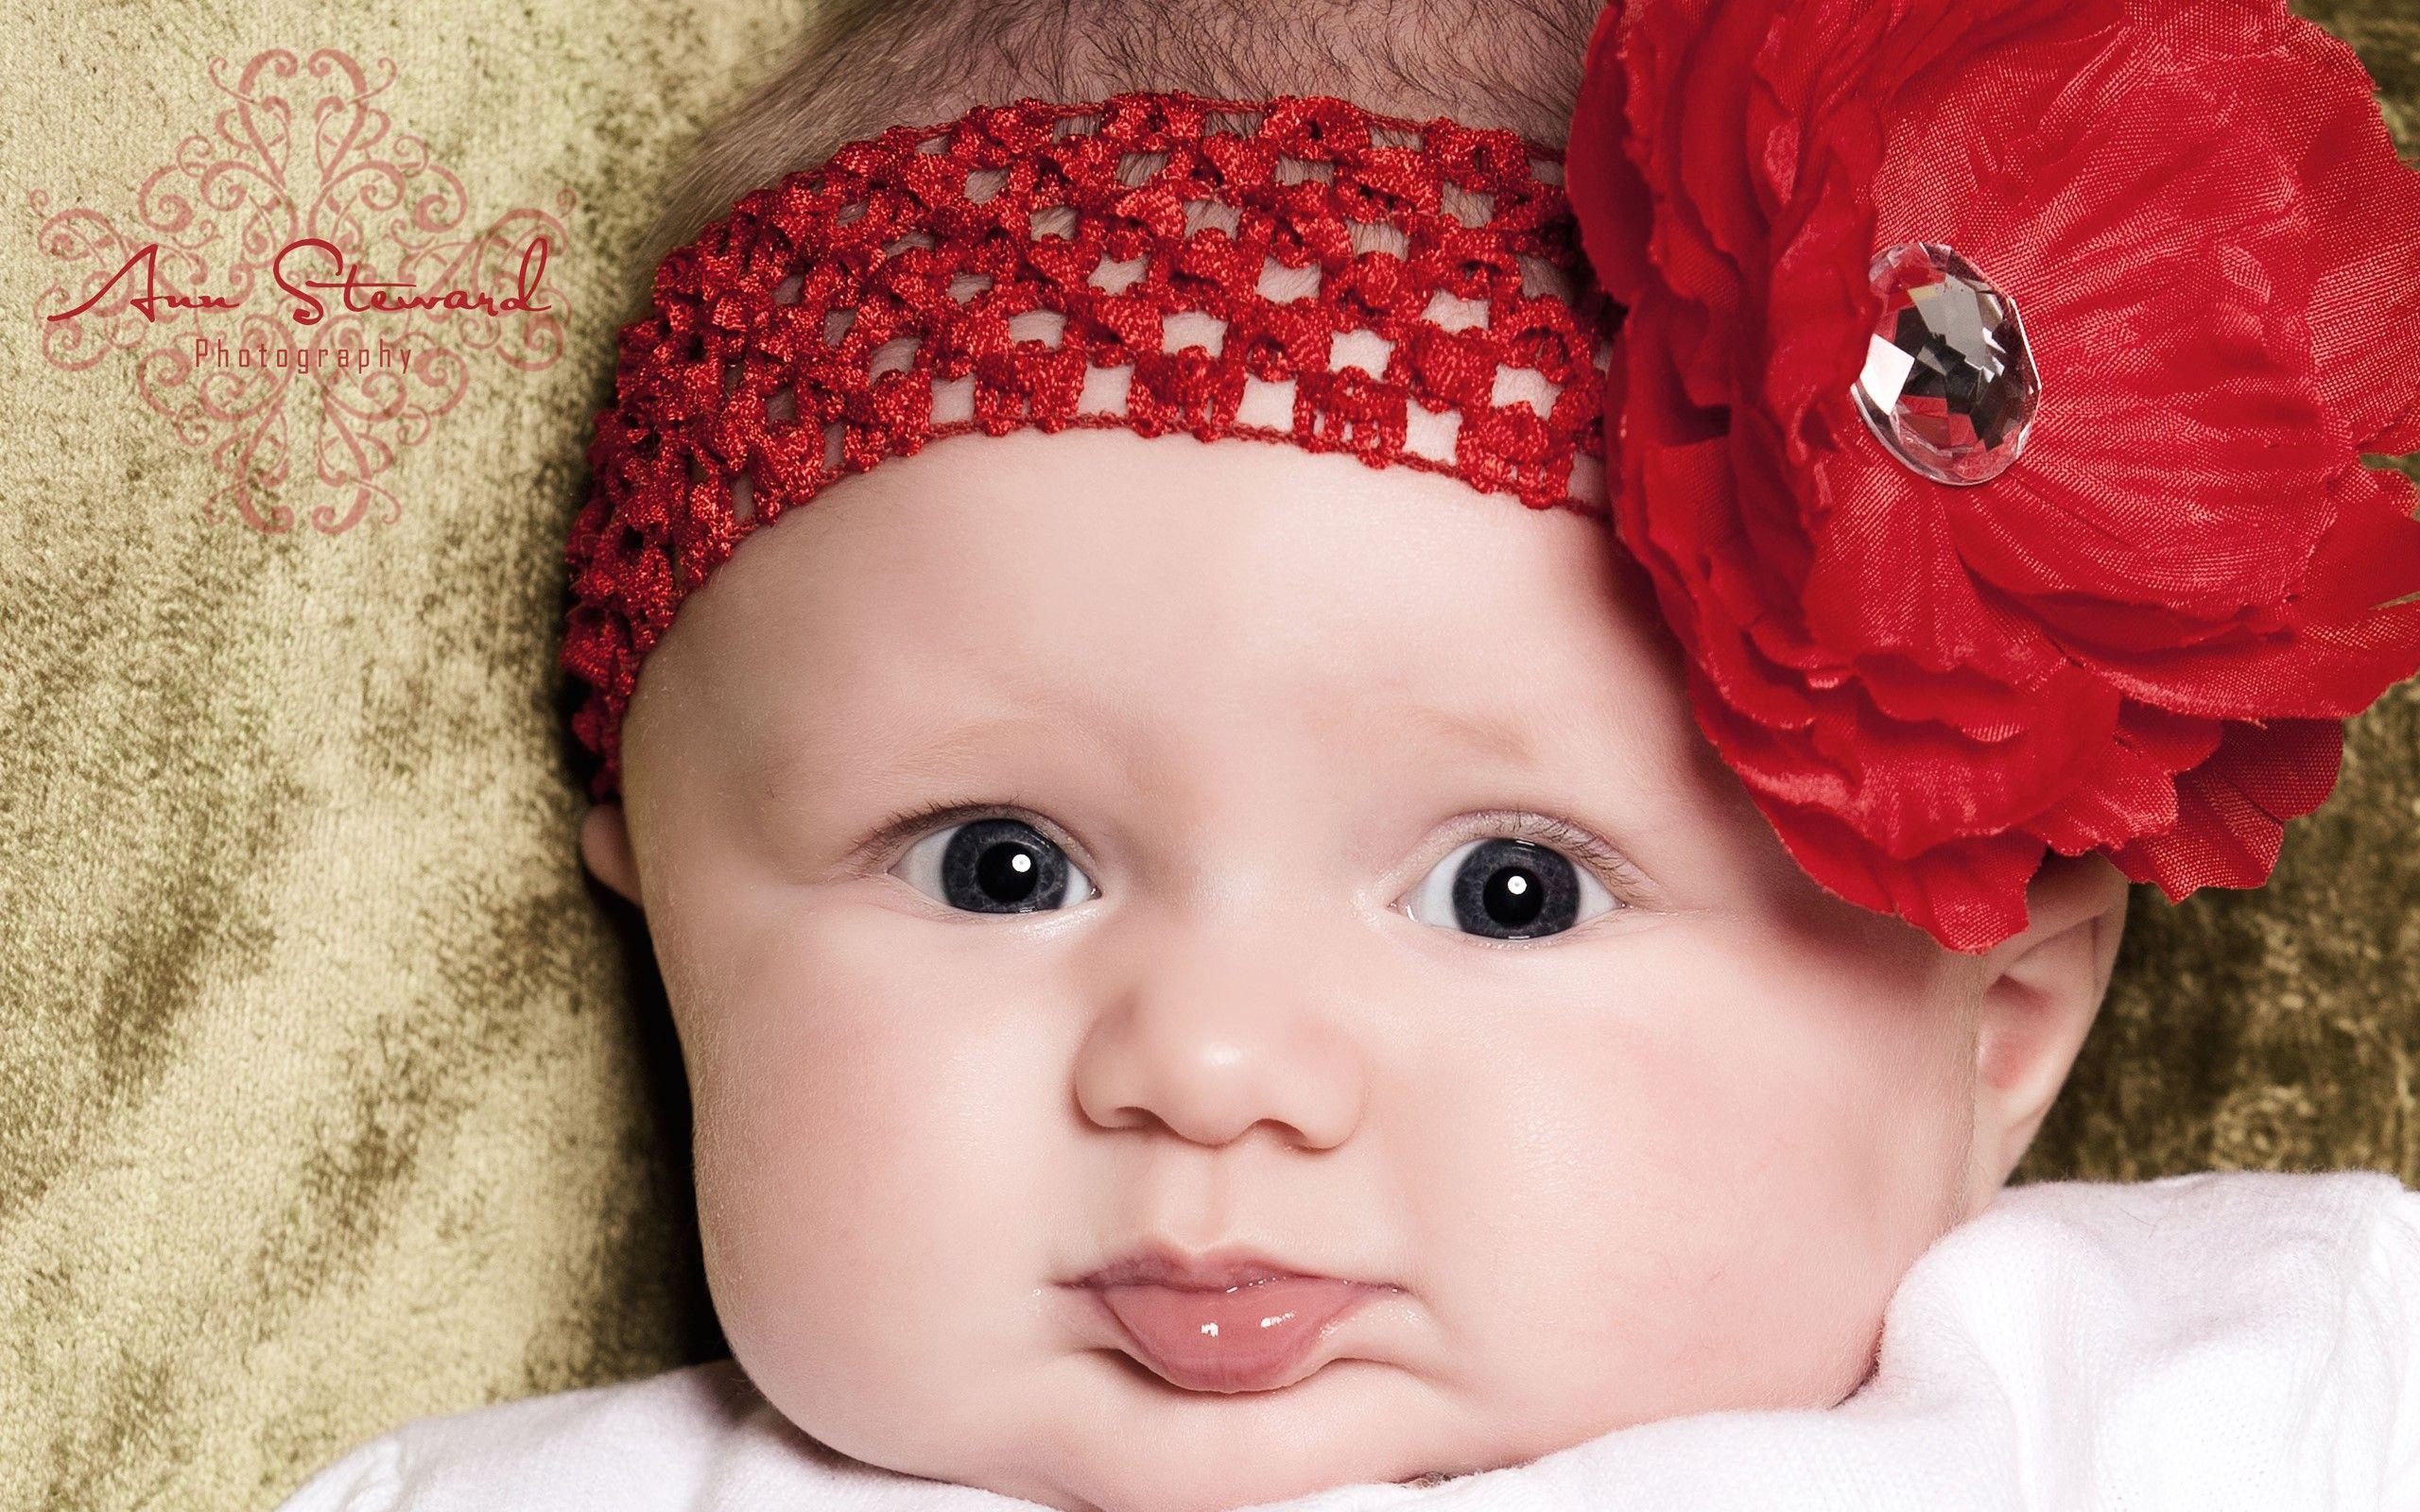 Wallpaper download baby girl - Cute Girl Babies Wallpapers Very Cute